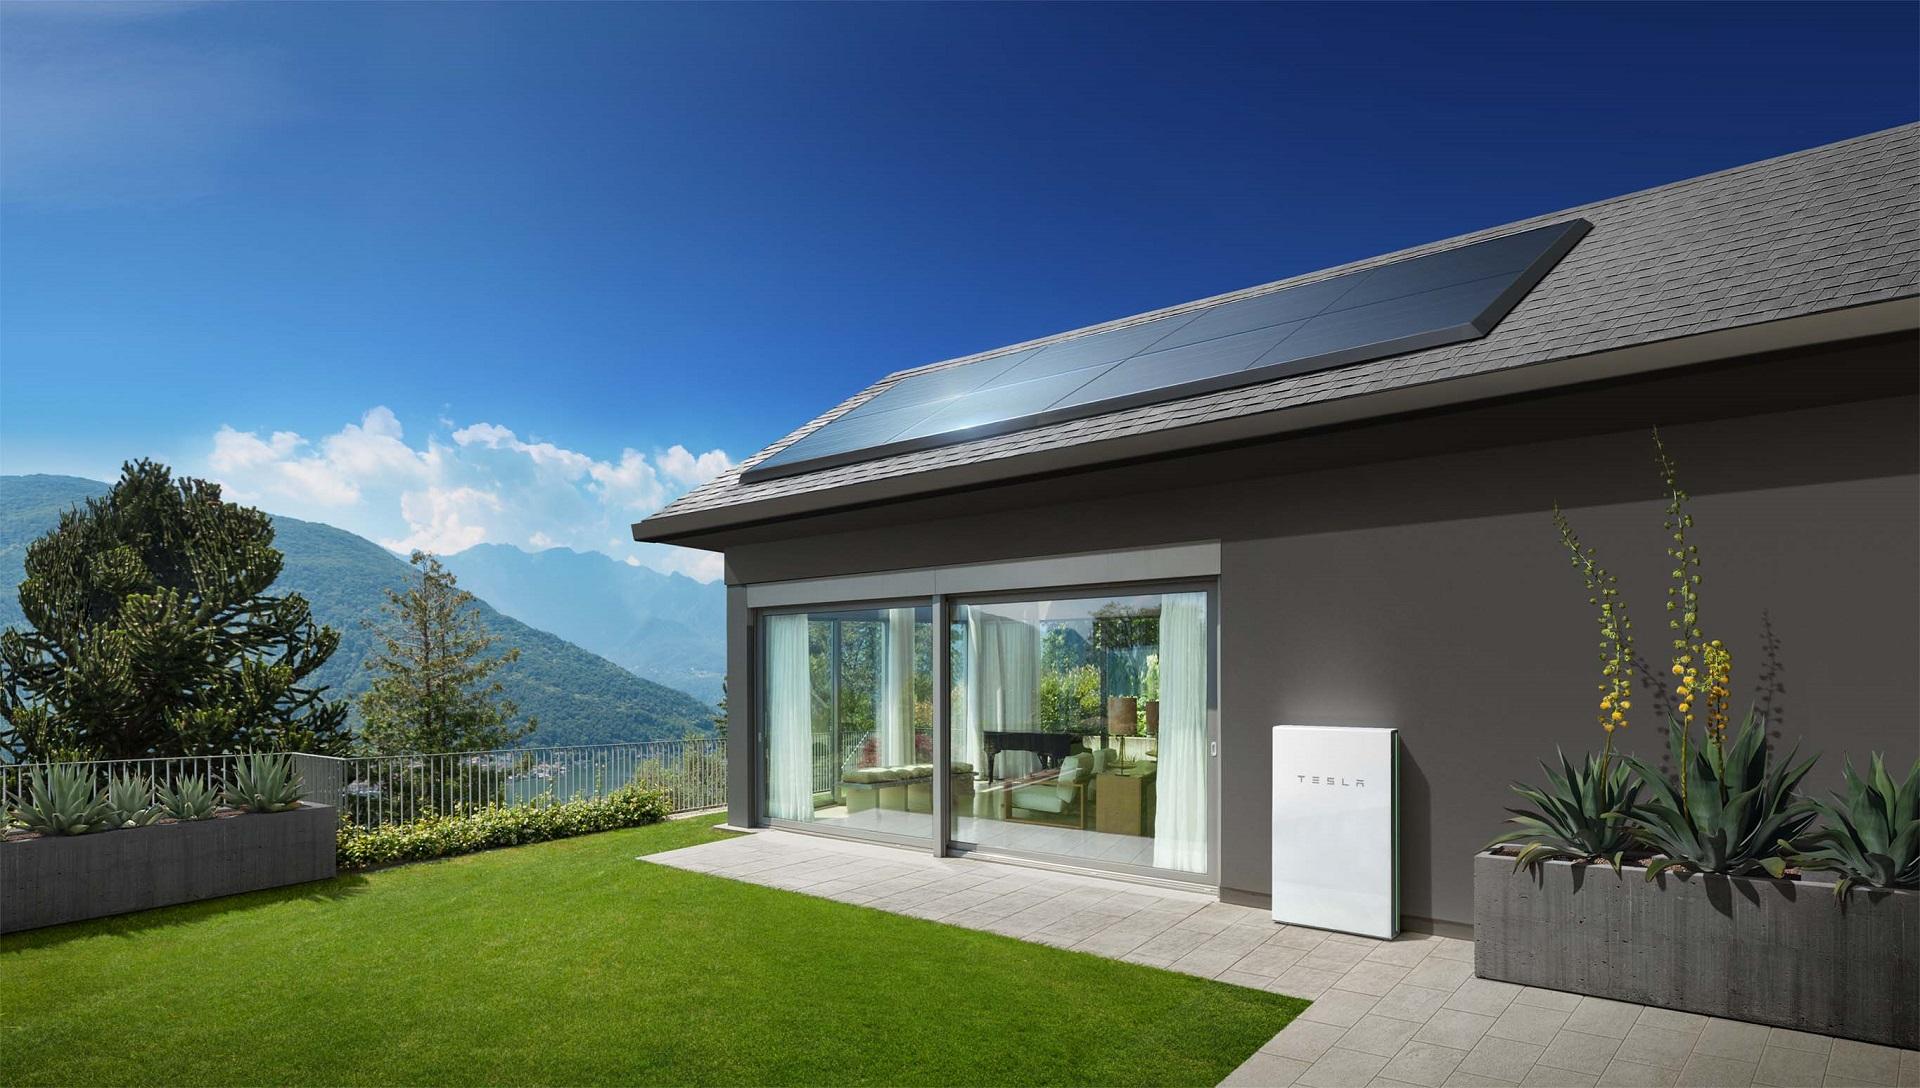 Tesla dará gratis paneles solares y baterías a 50.000 hogares en Australia